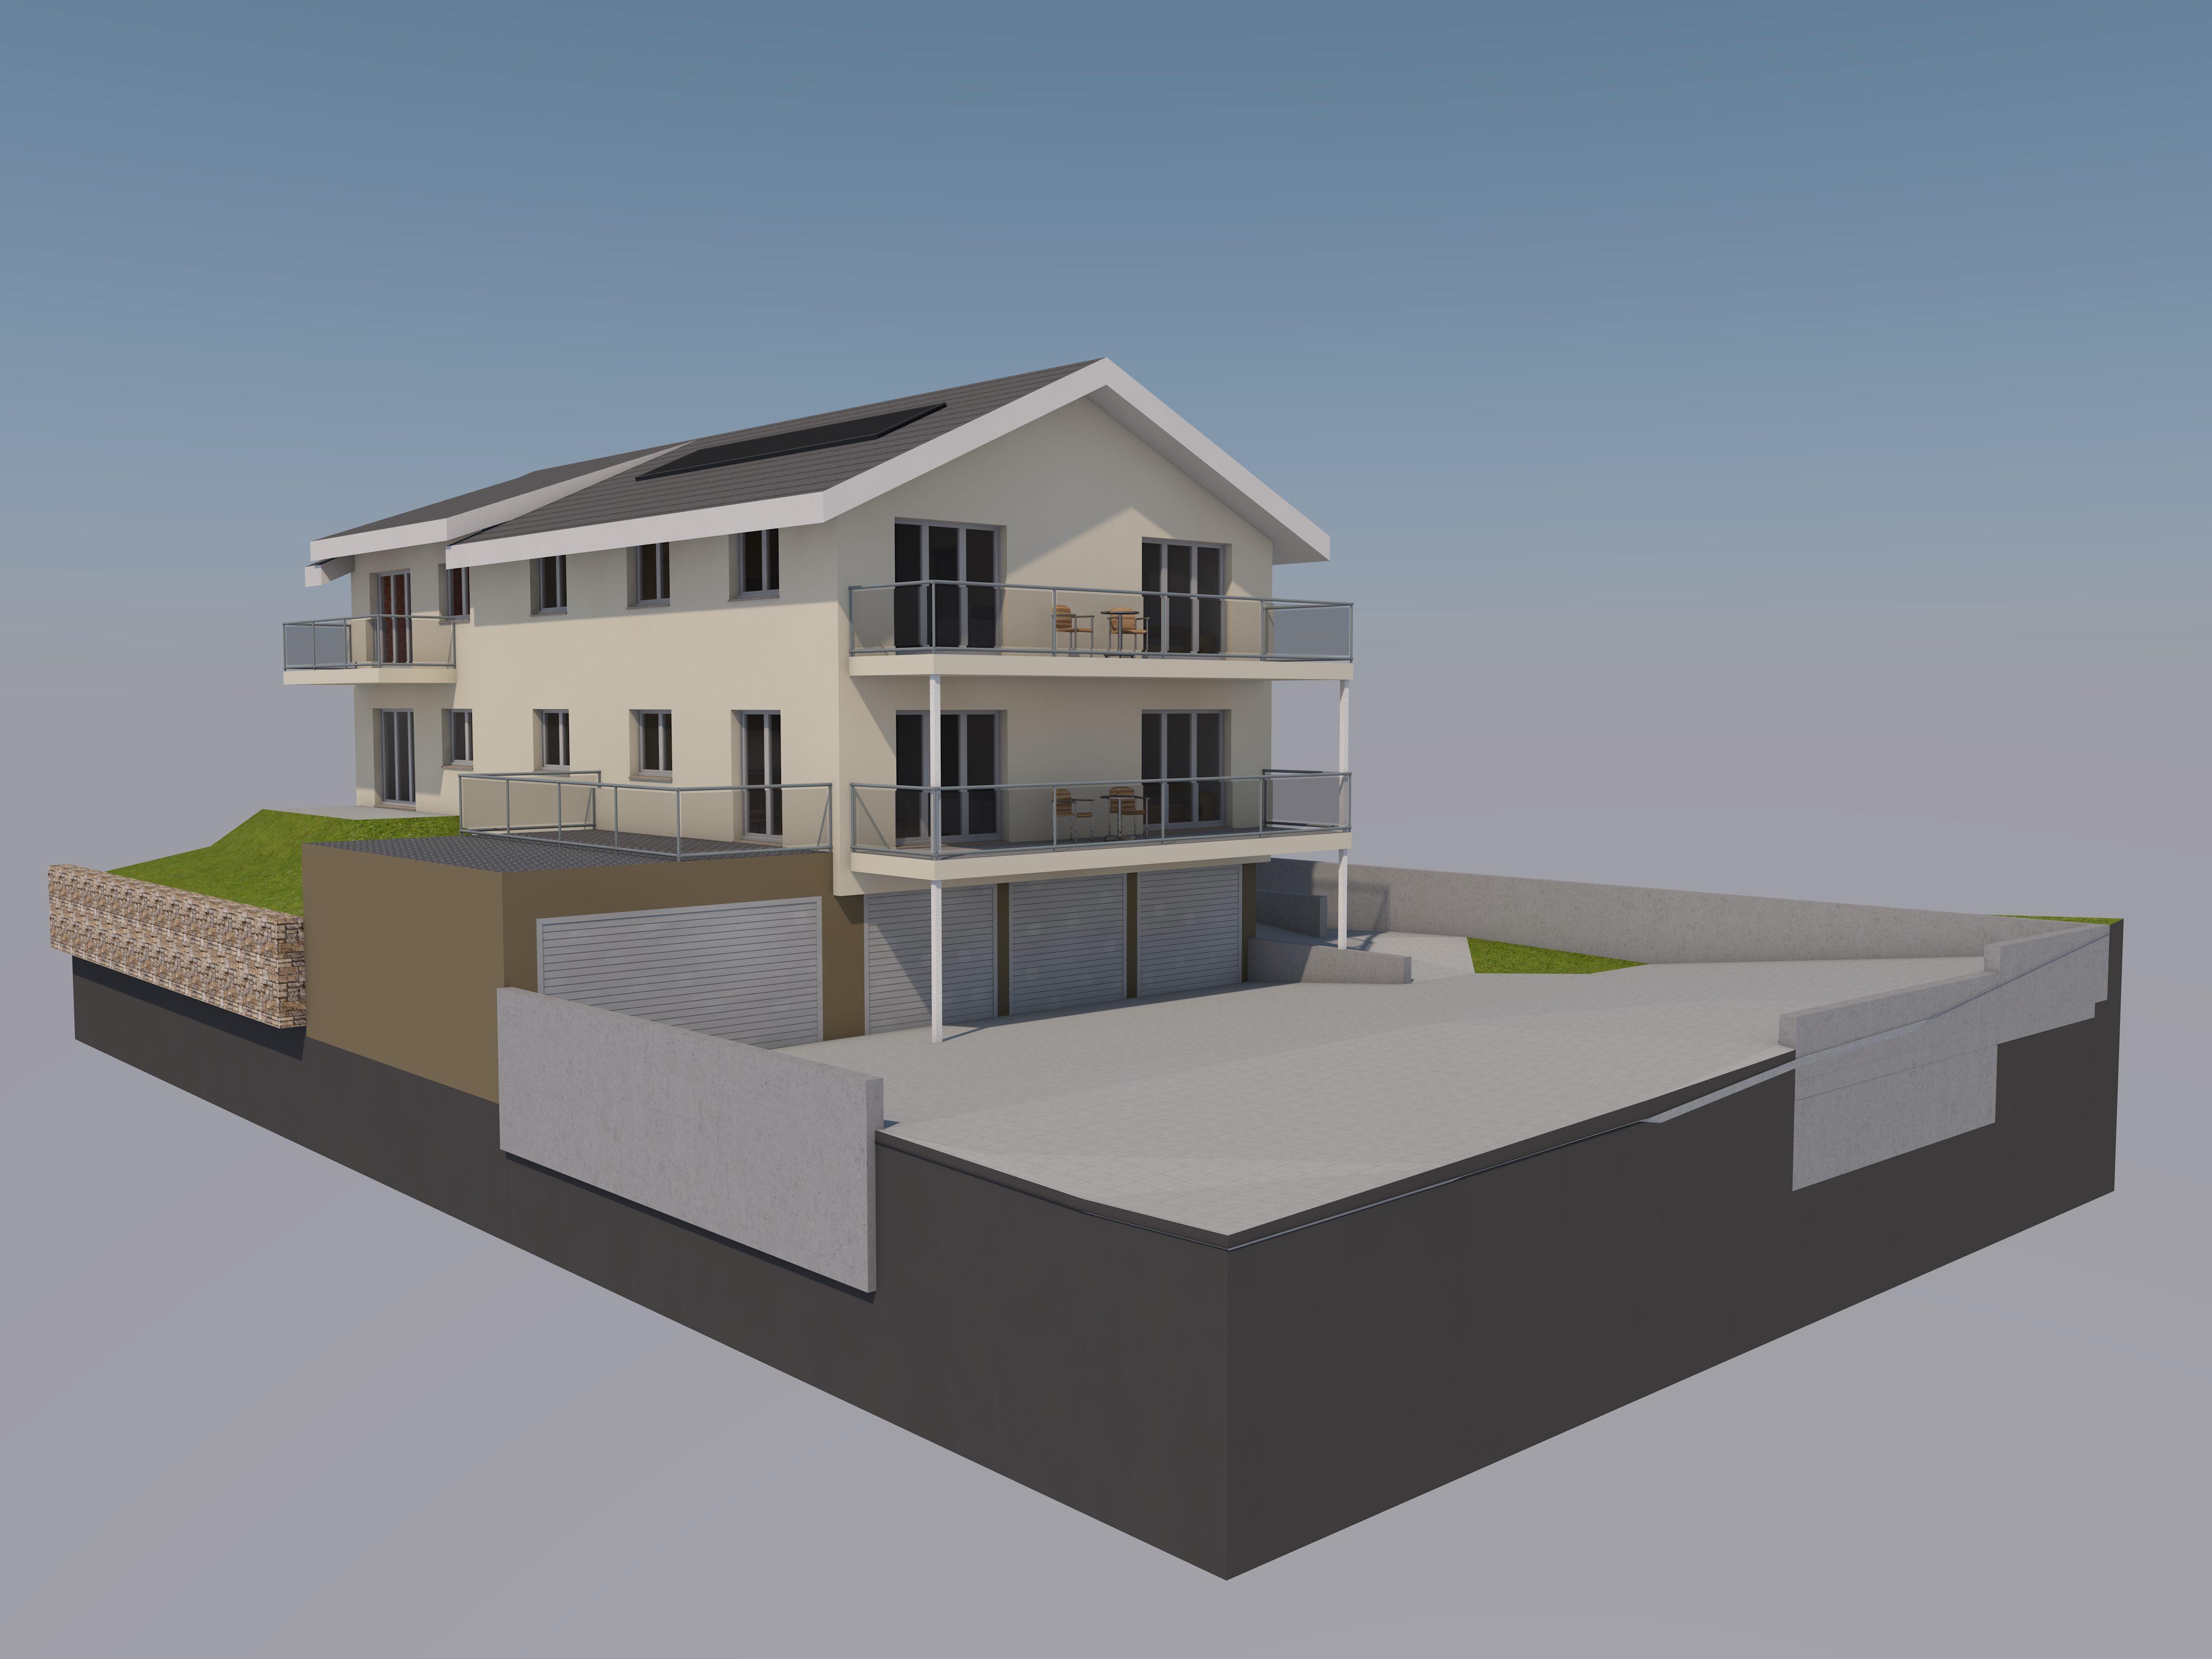 Neubau modern moderne Architektur MFH Mehrfamilienhaus Schänis Kaltbrunn Ronner Architketur Bauleitung Planung